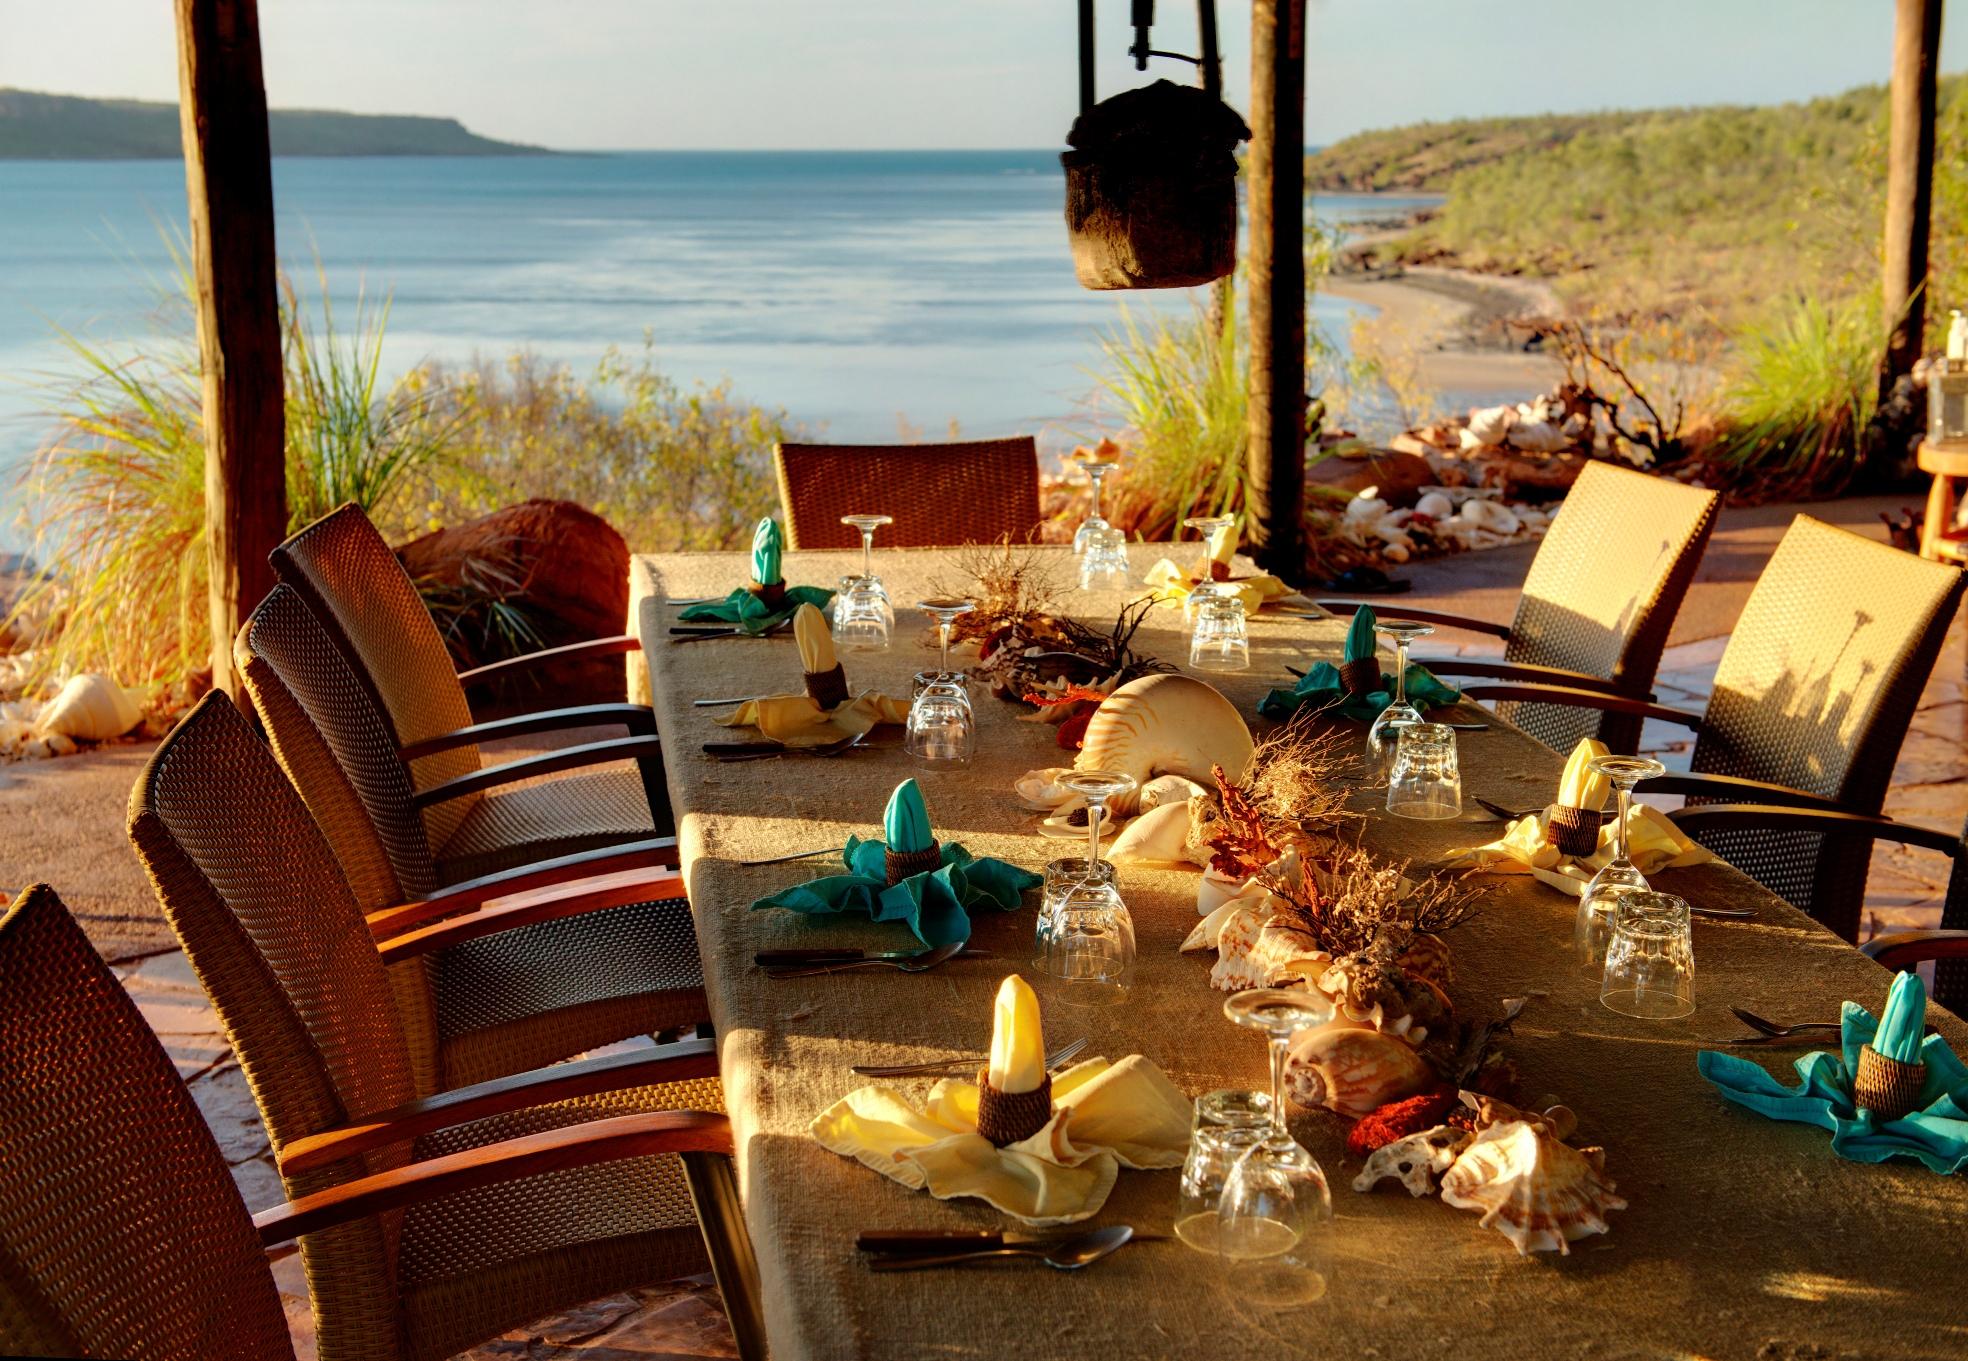 Wine dine and unwind at Eagle lodgeFaraway Bay